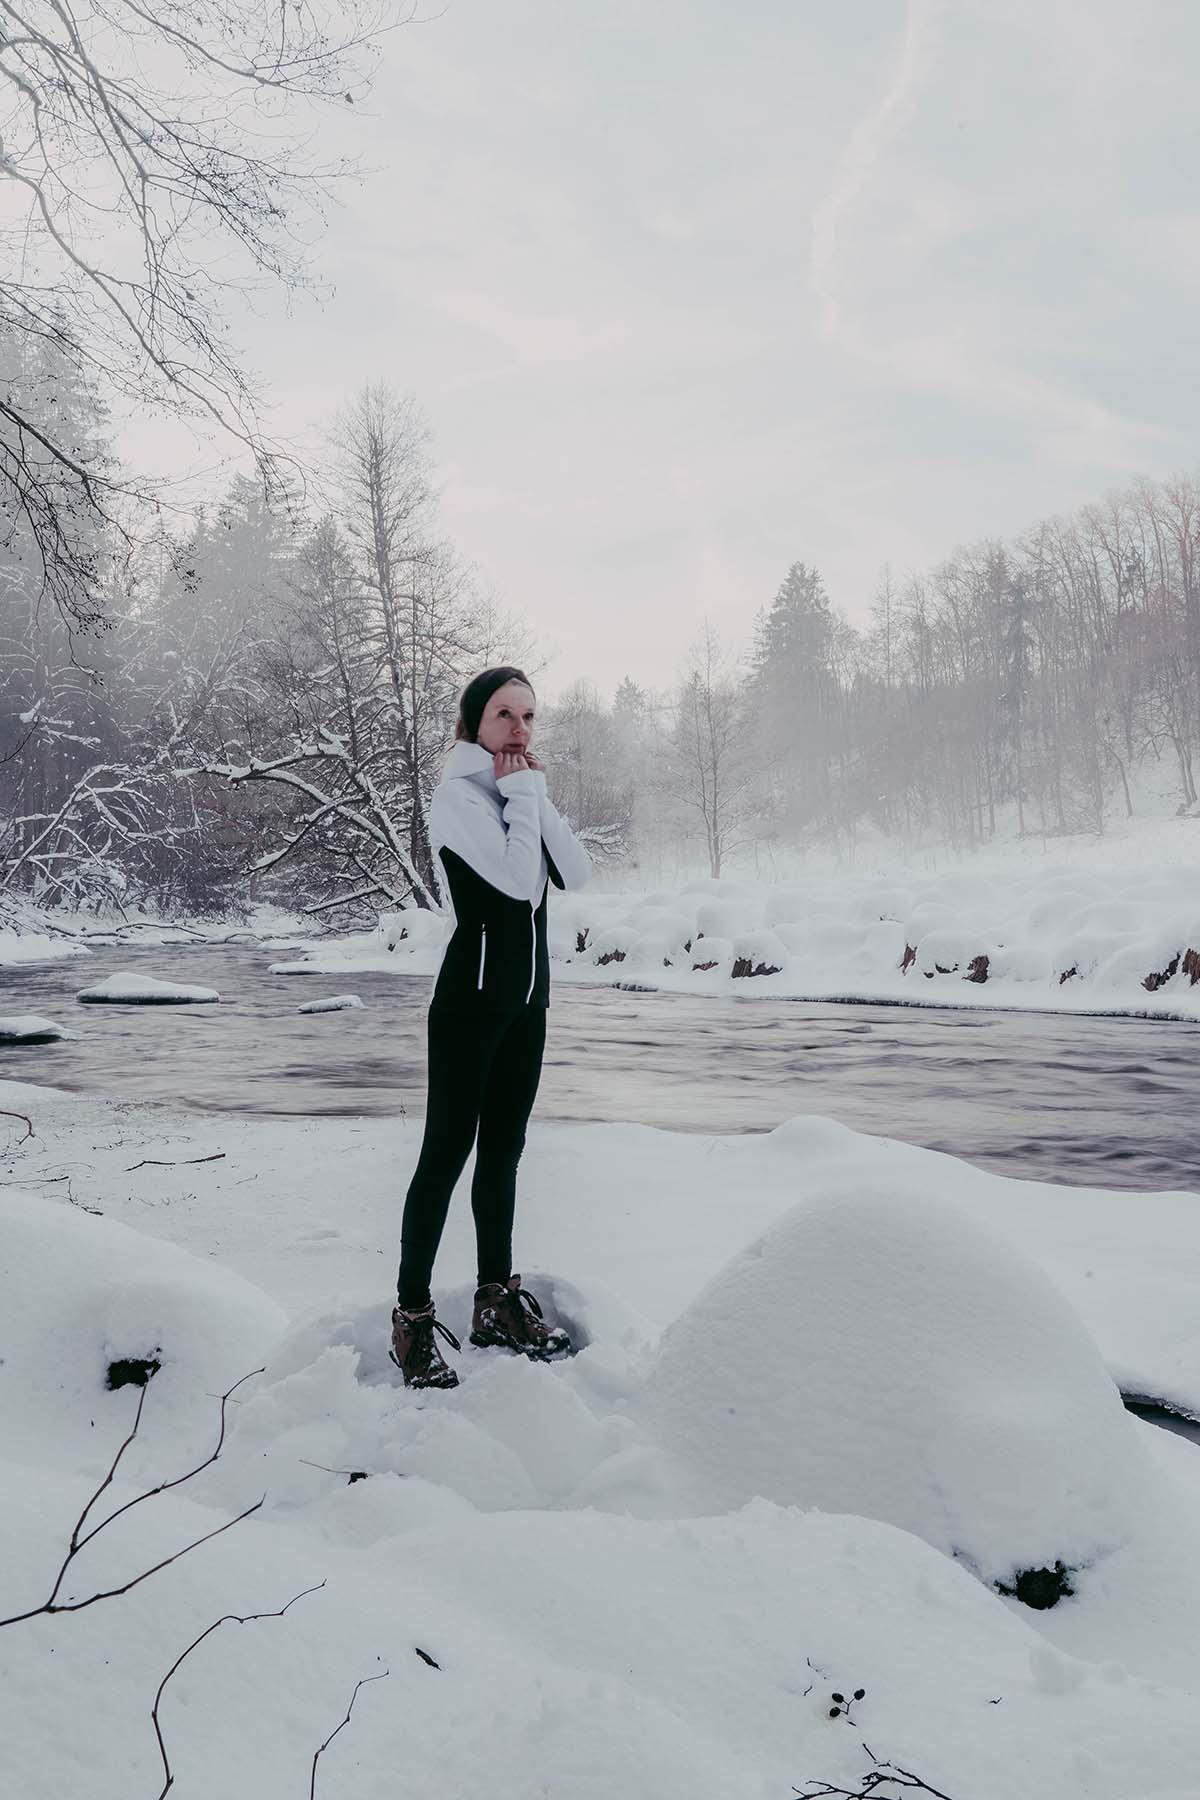 ilz-frau-winter-schnee